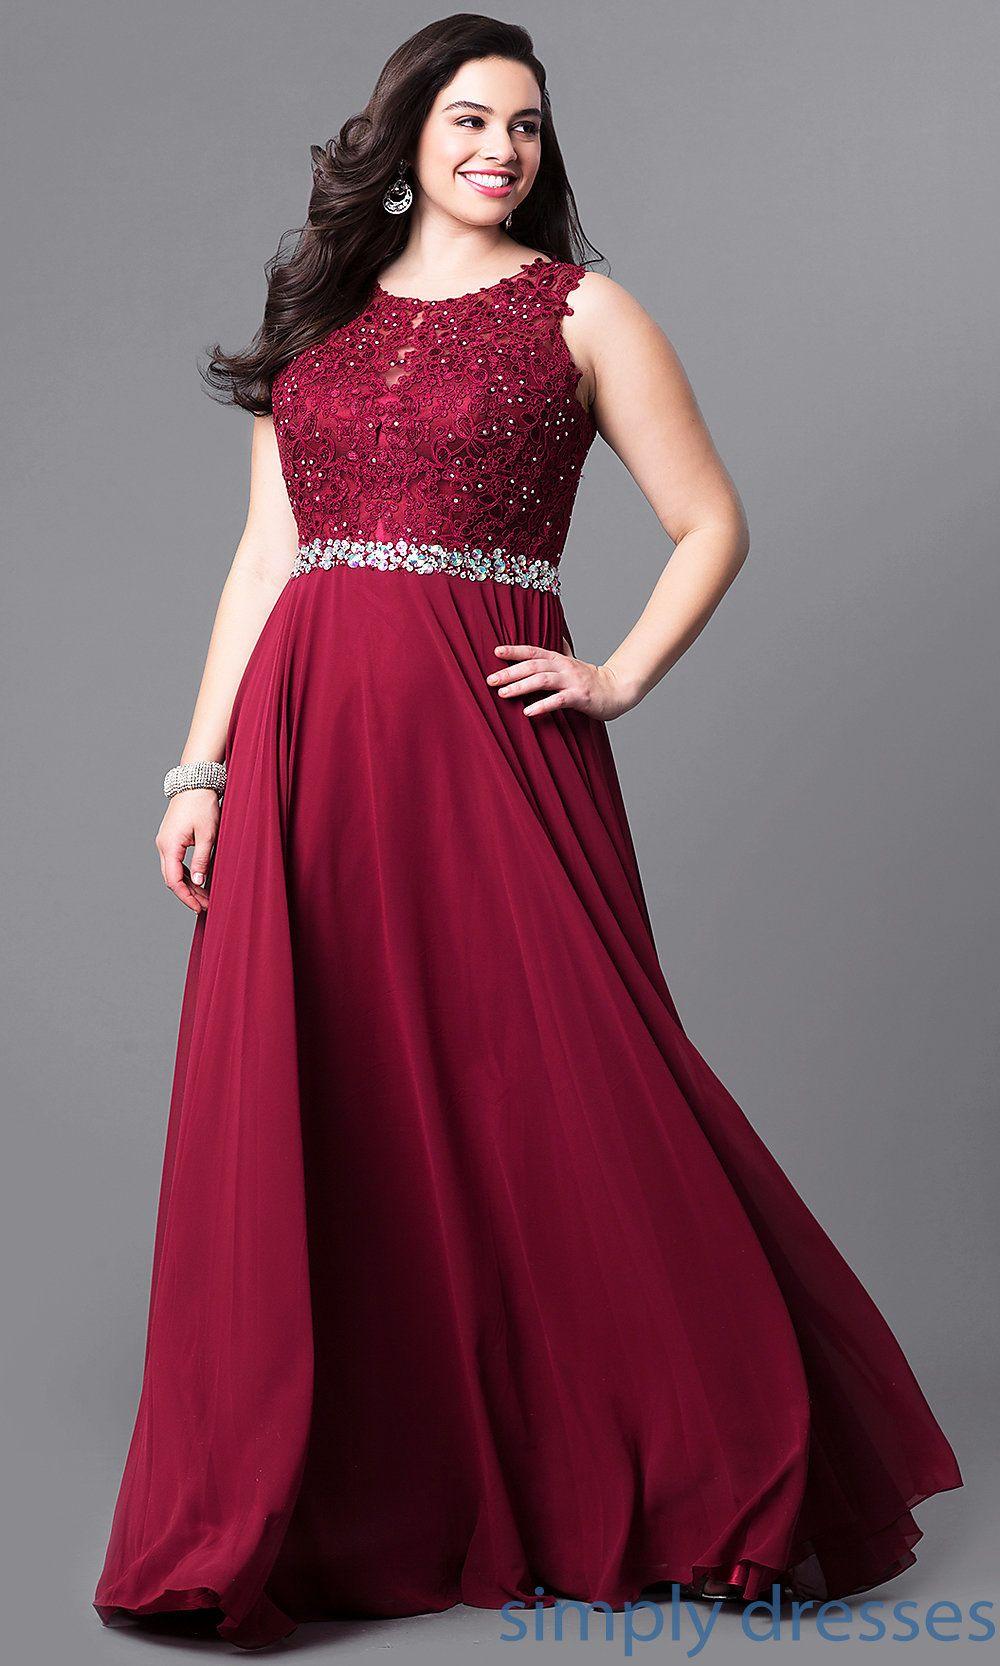 Plus Size Prom Dresses Under $200